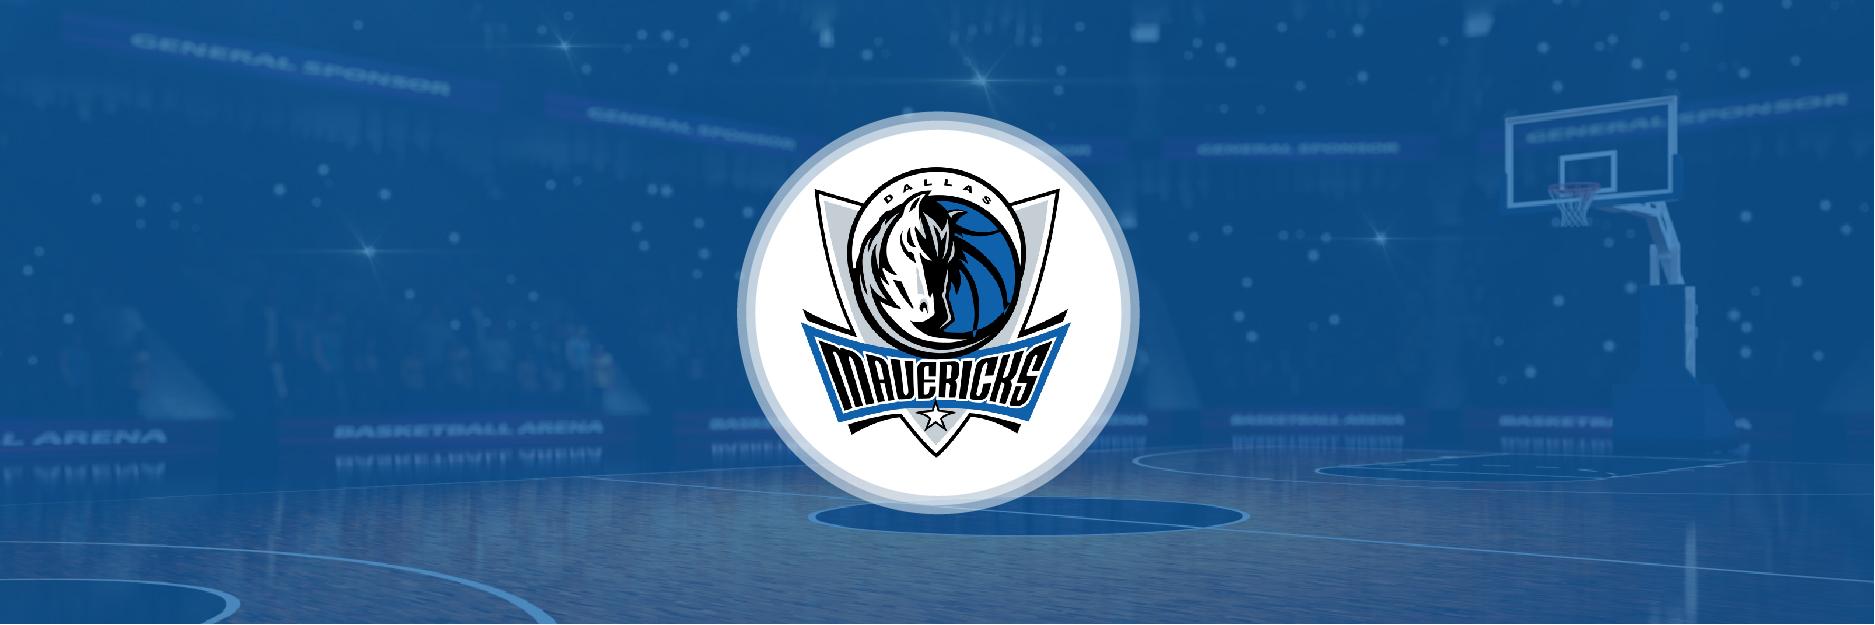 NBA Dallas Mavericks 2020 Season Analysis